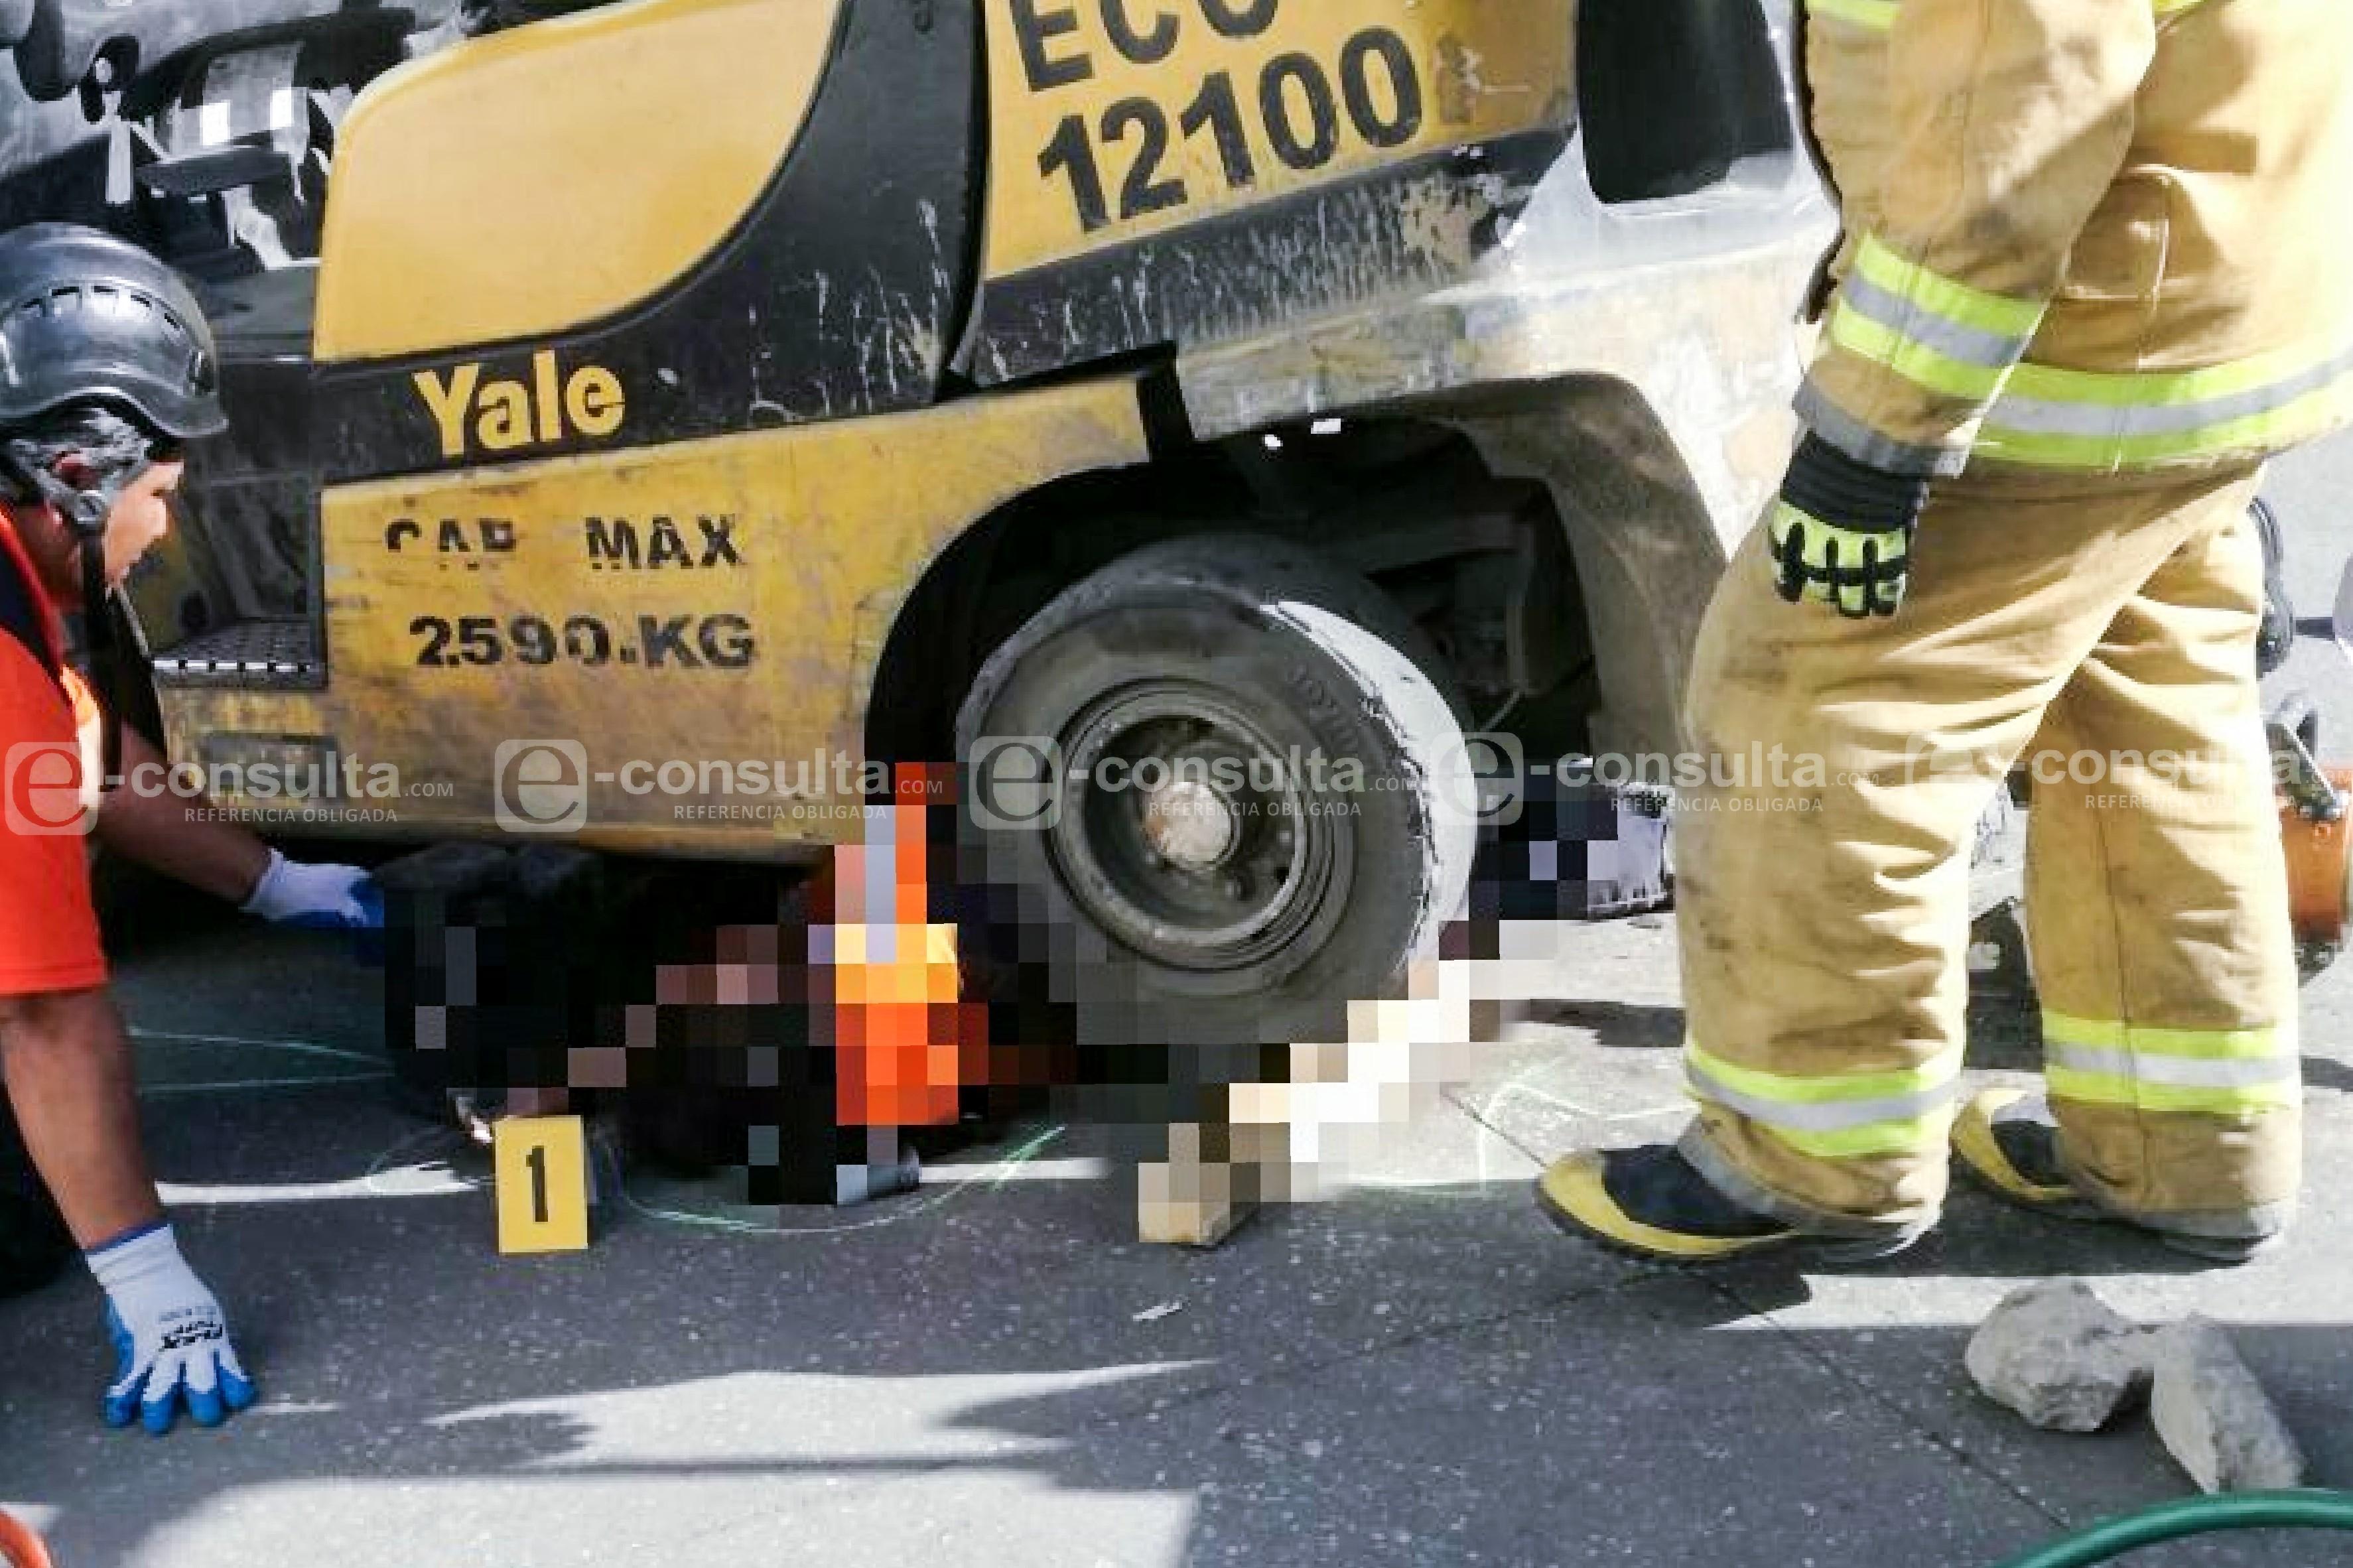 Muere trabajadora de Benteler atropellada por montacargas